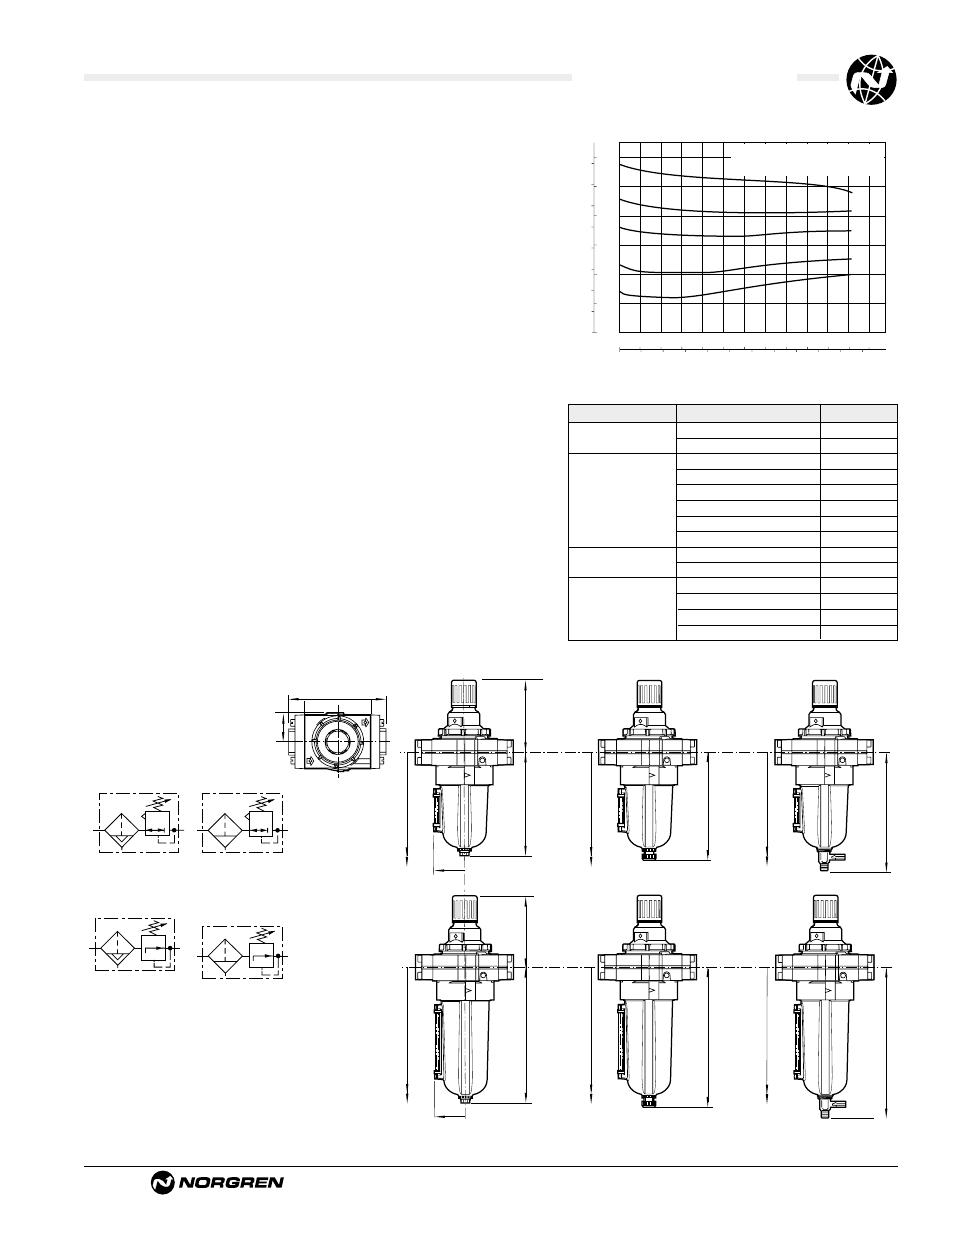 B68e/g filter/regulators, Ale-12-13, Technical data